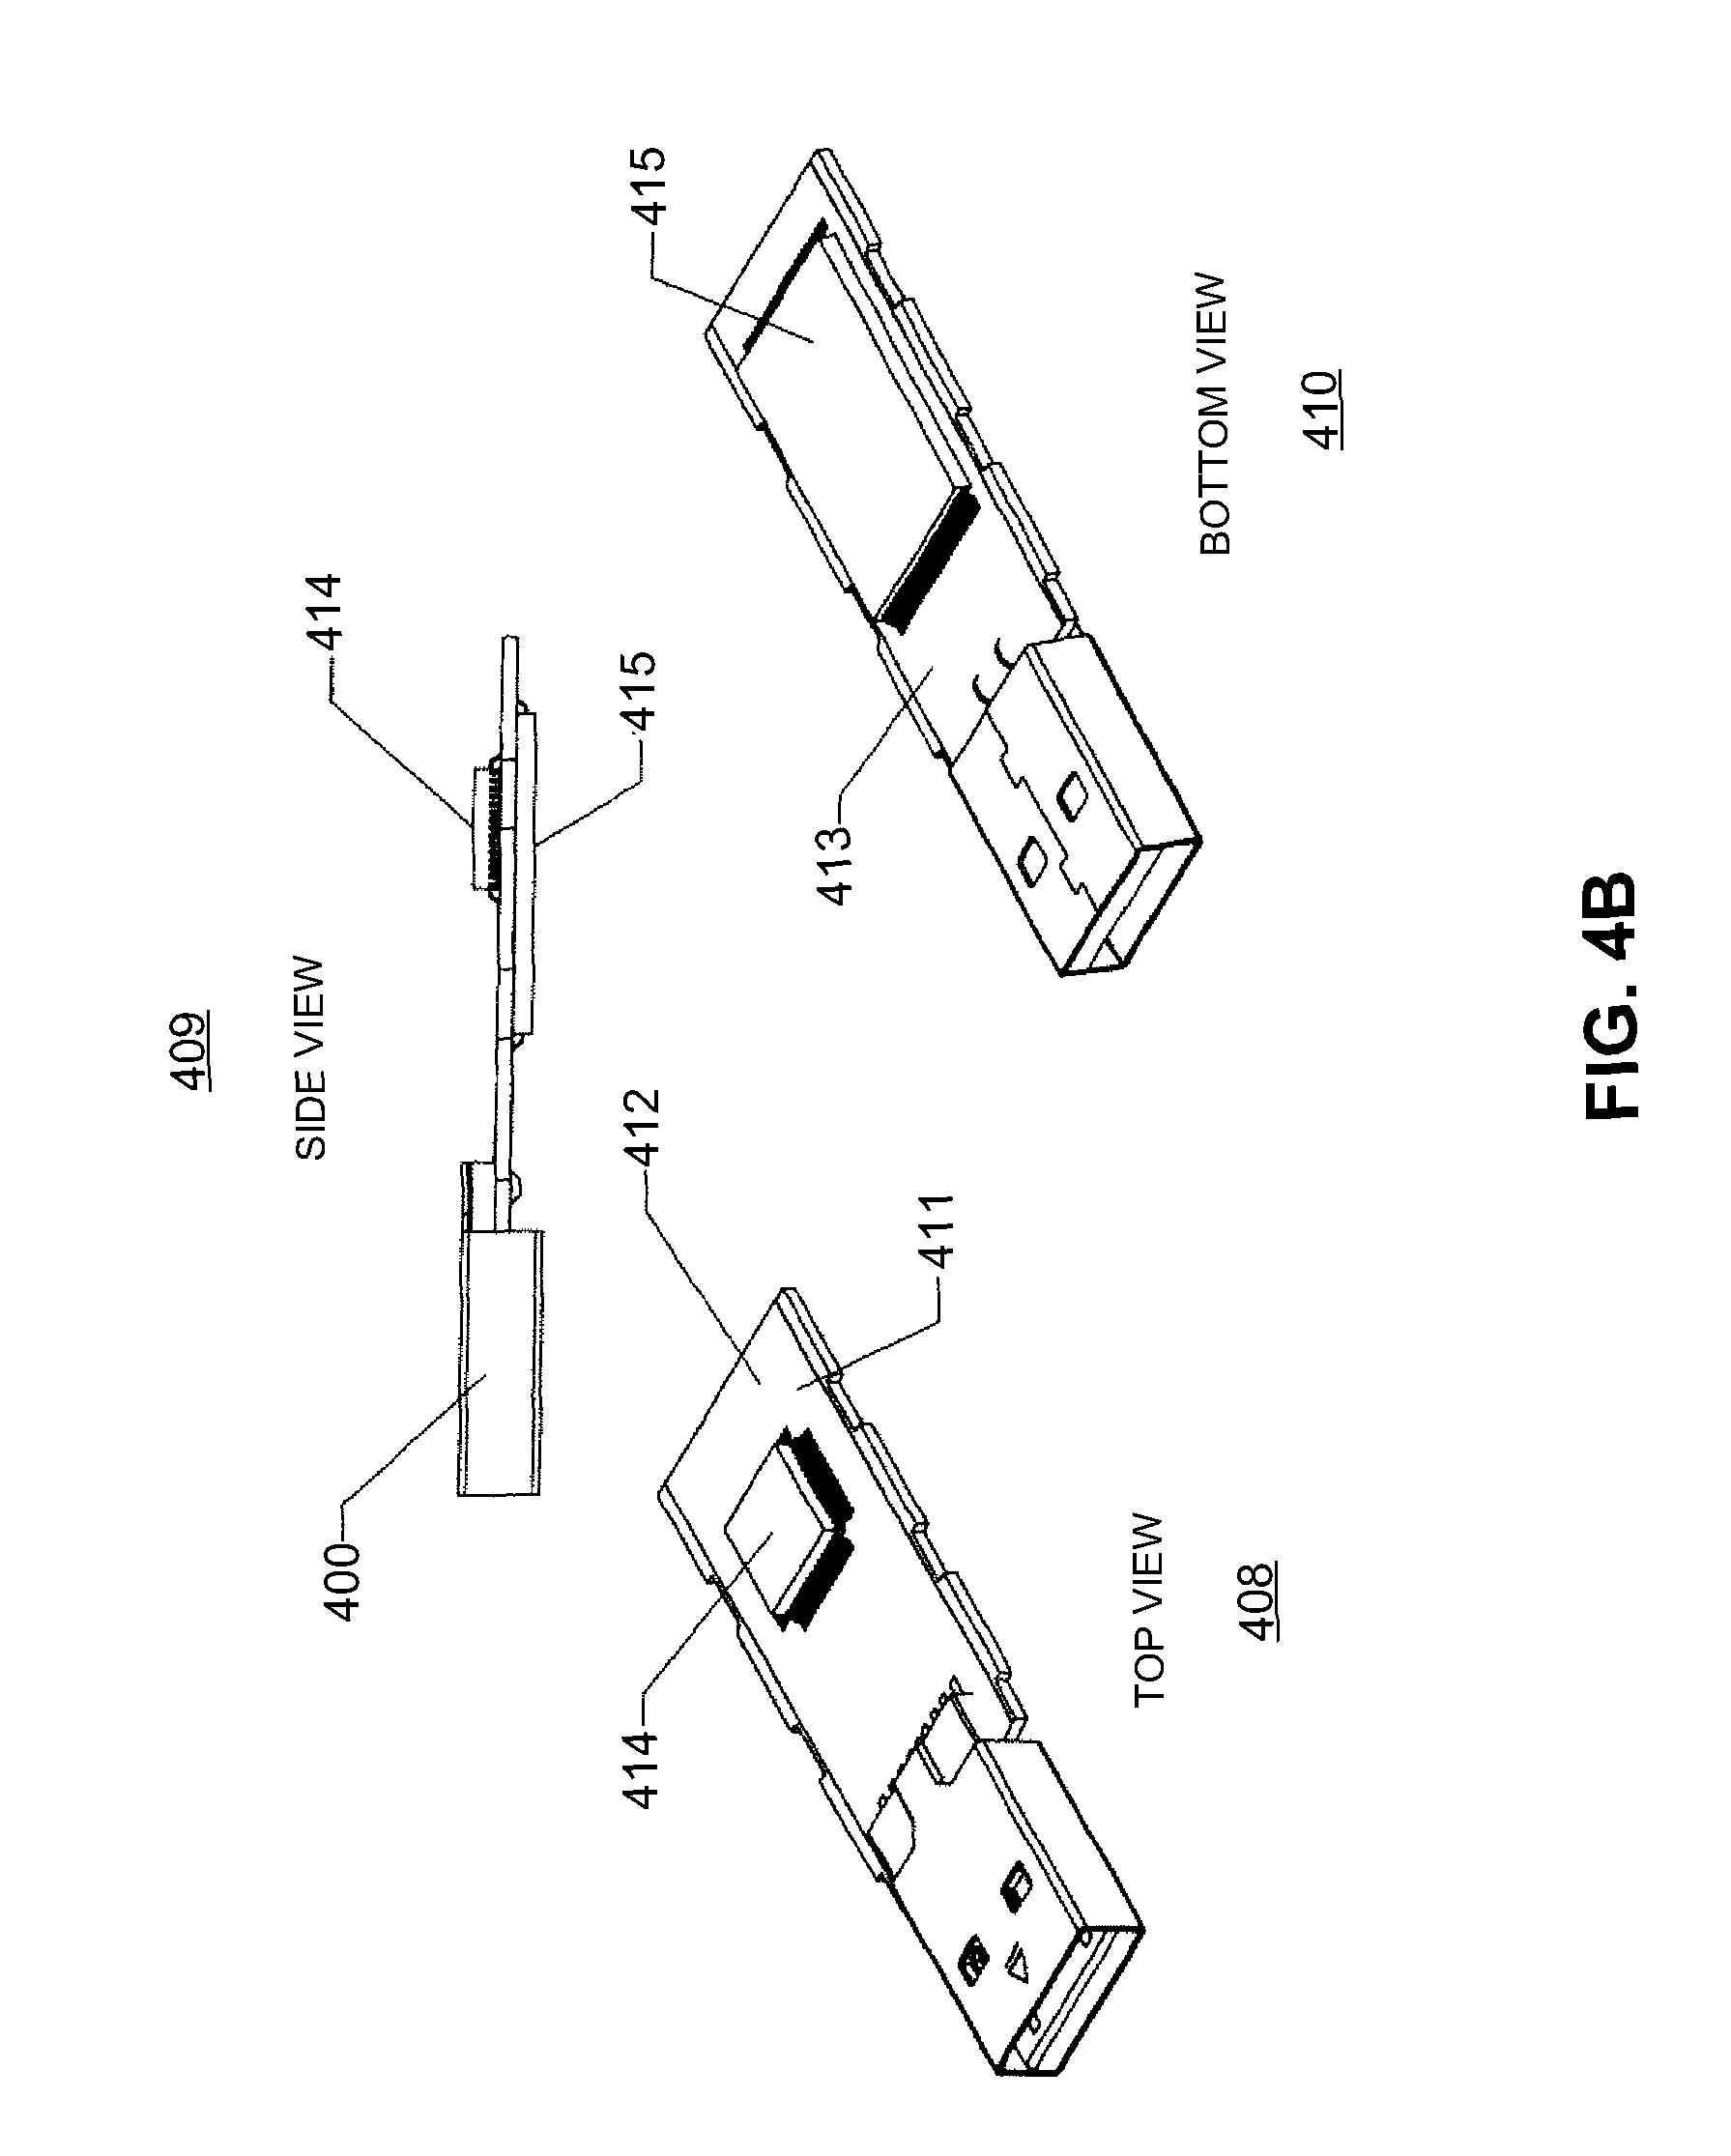 hight resolution of 451m relay wiring diagram 5 wire 3 pole relay diagram 451m relay trim fix dei 451m